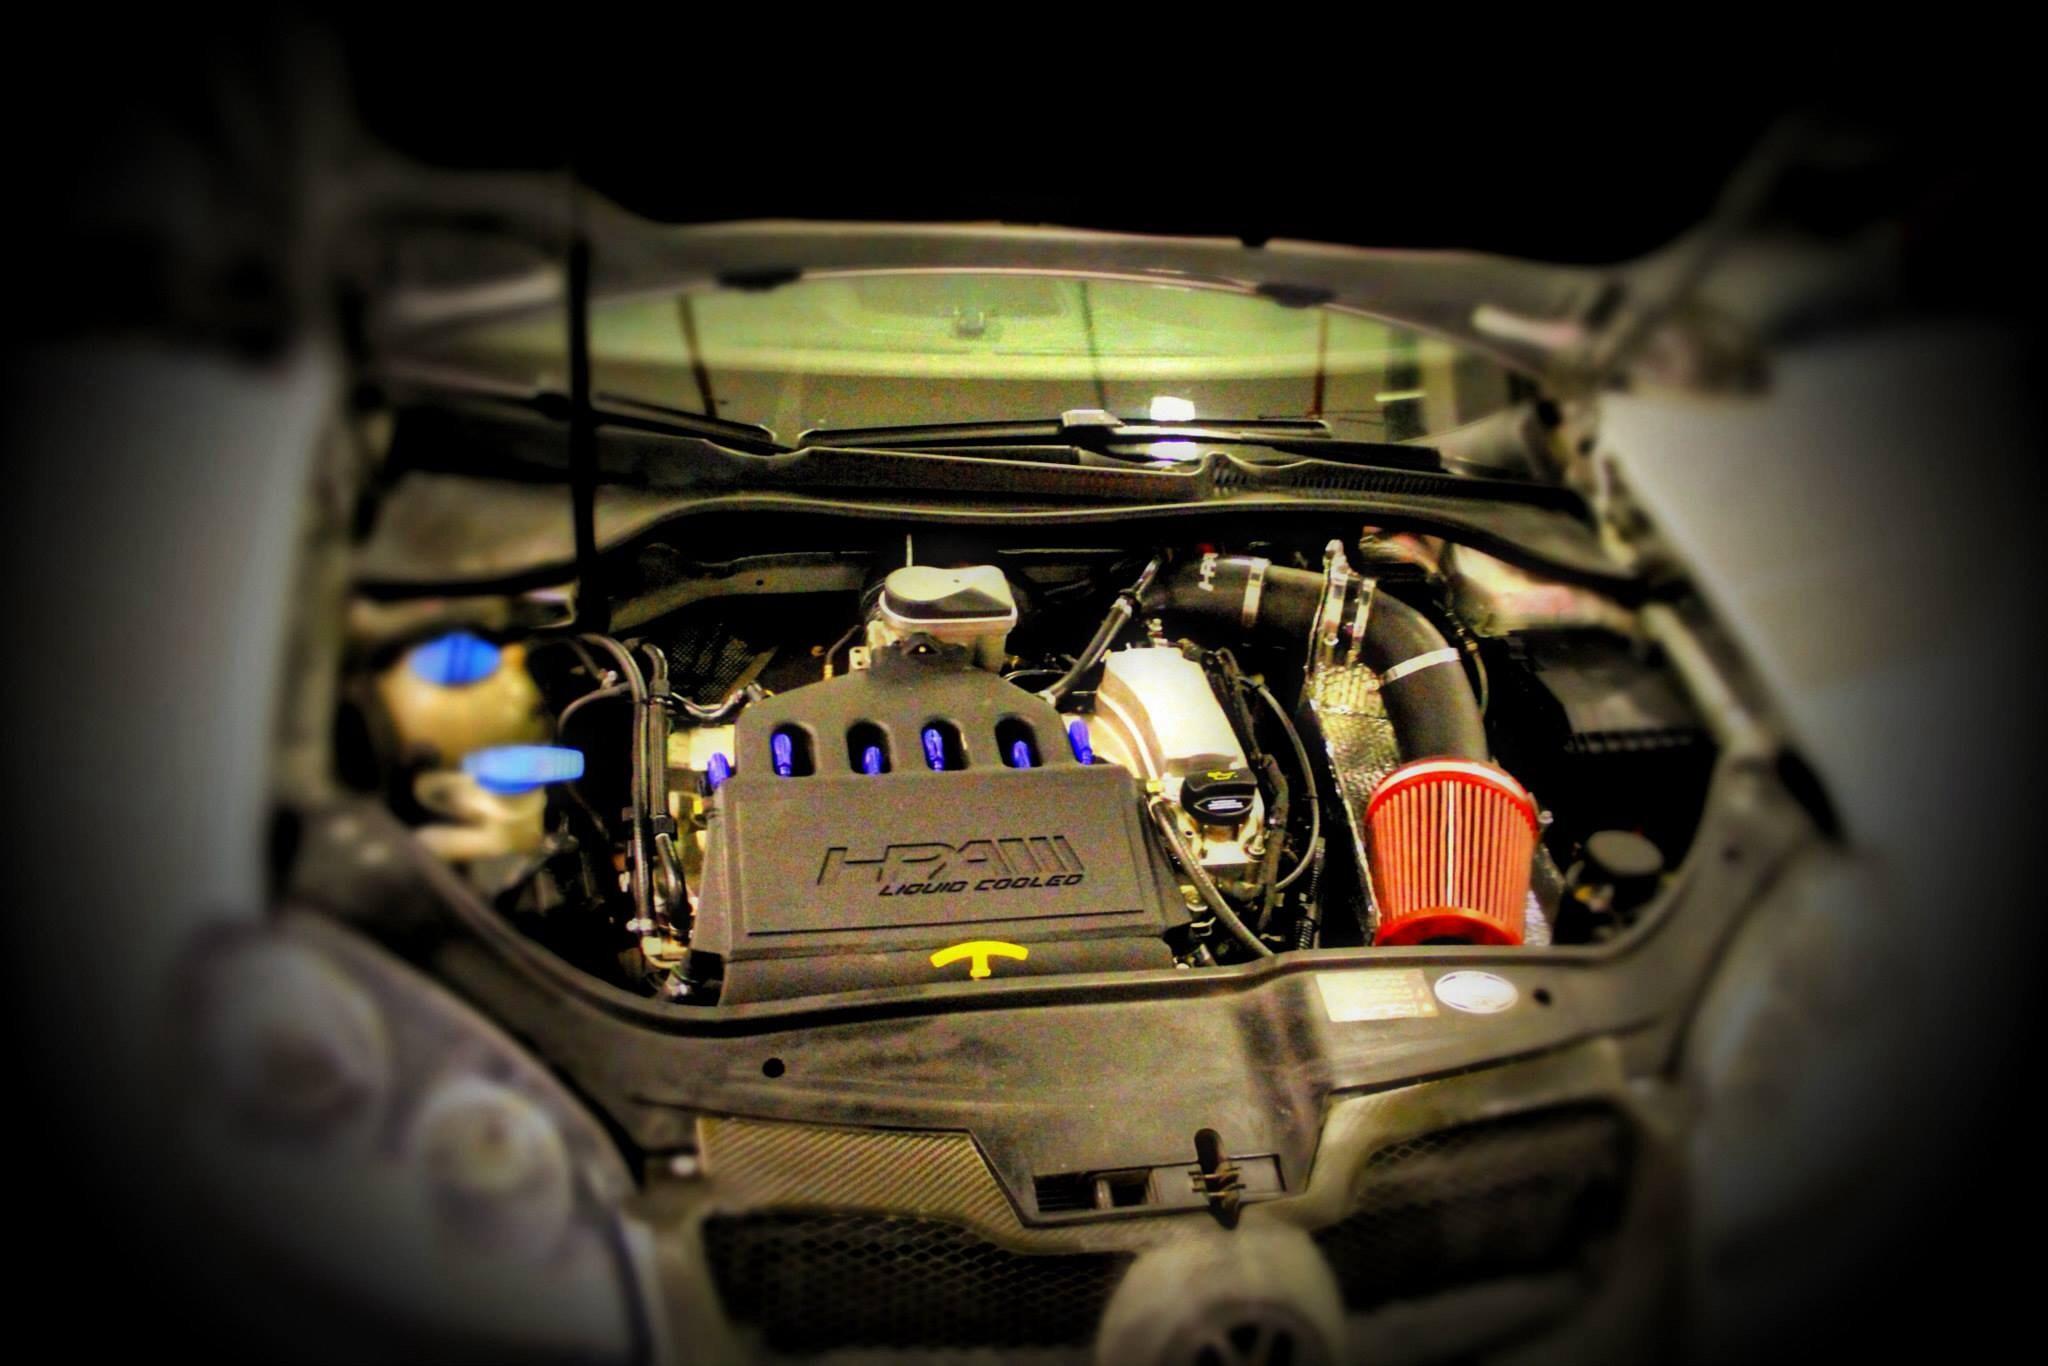 Hpa Turbo Mk5 R32 Hits The Track At Yas Marina Abu Dhabi